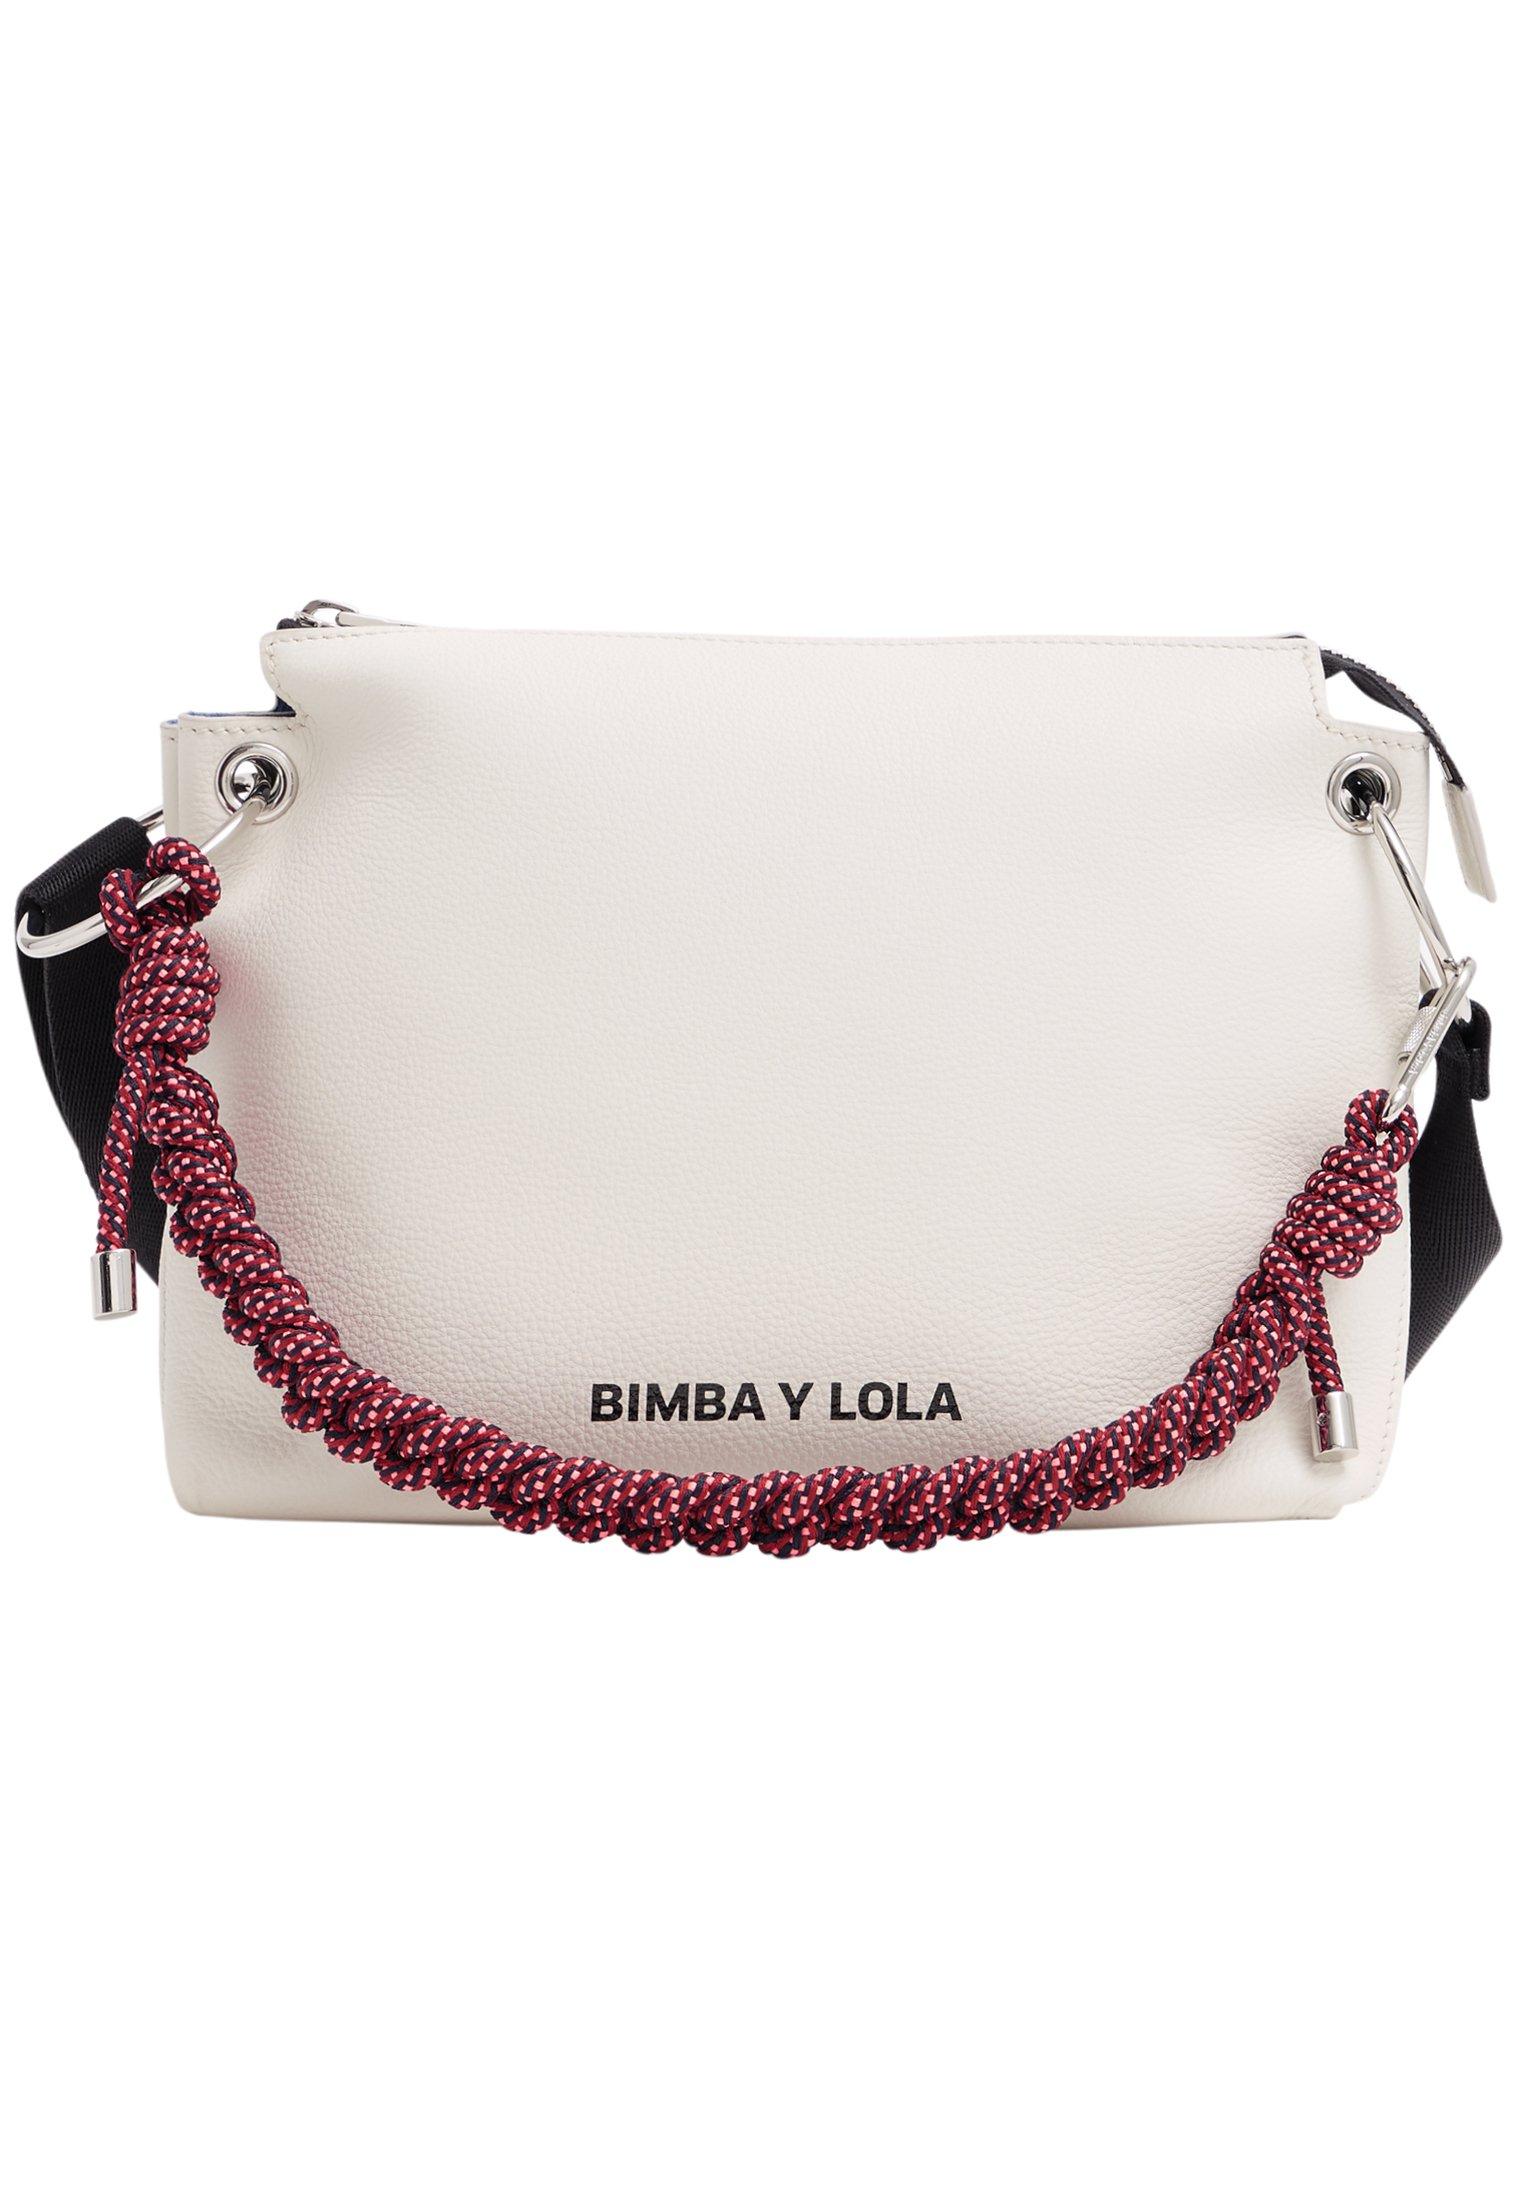 Bimba Y Lola Schoudertas - White